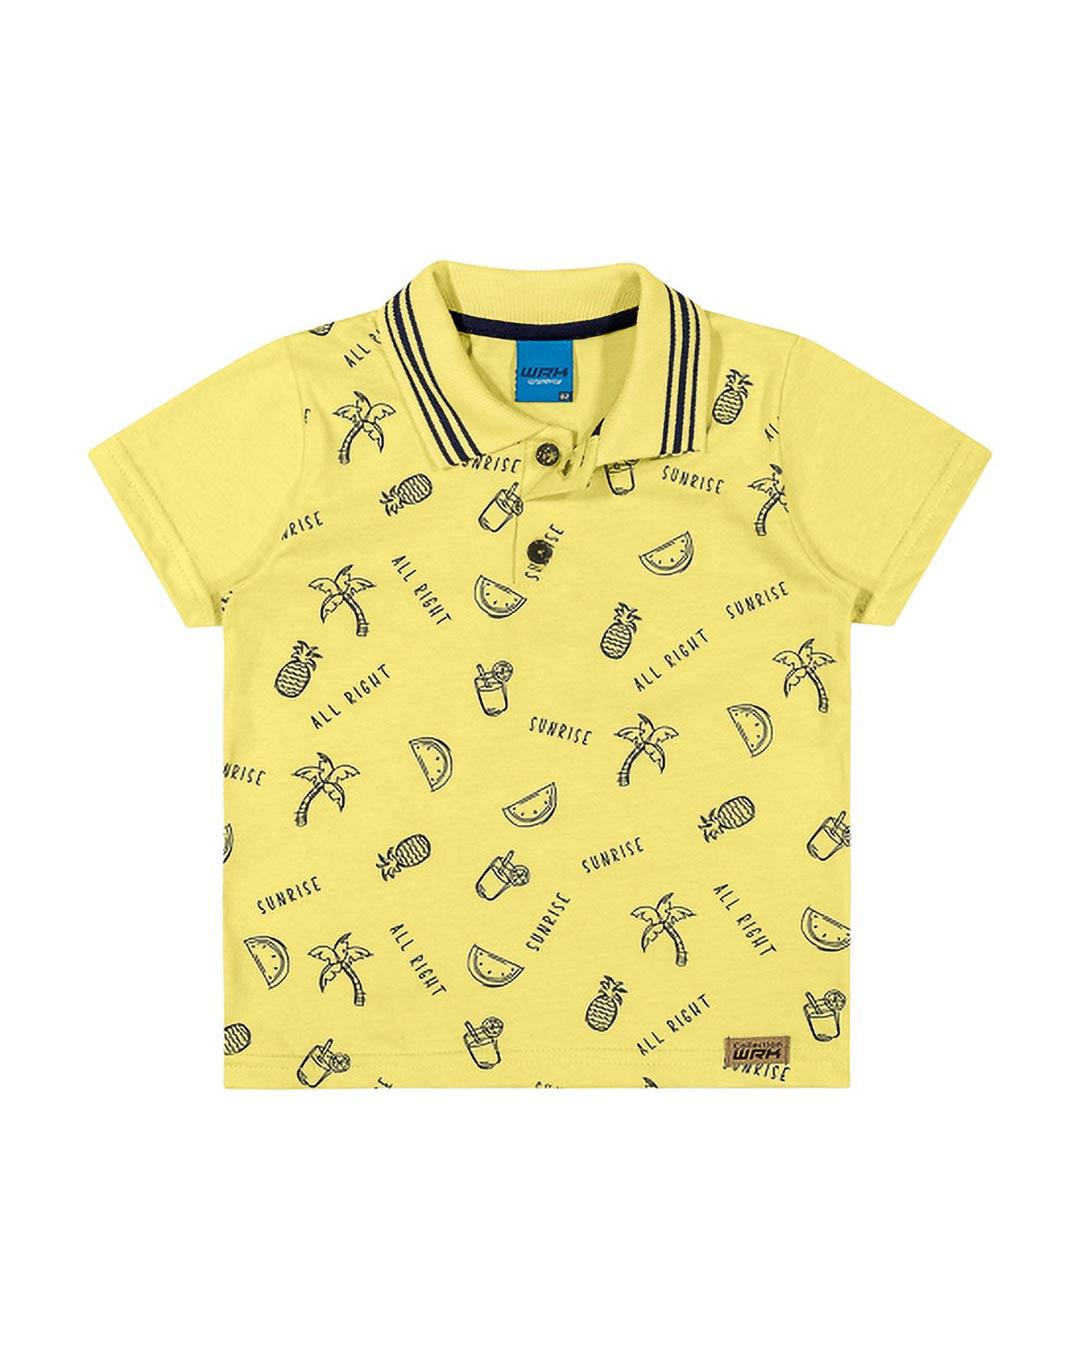 Camisa Polo Infantil Sunrise - WRK